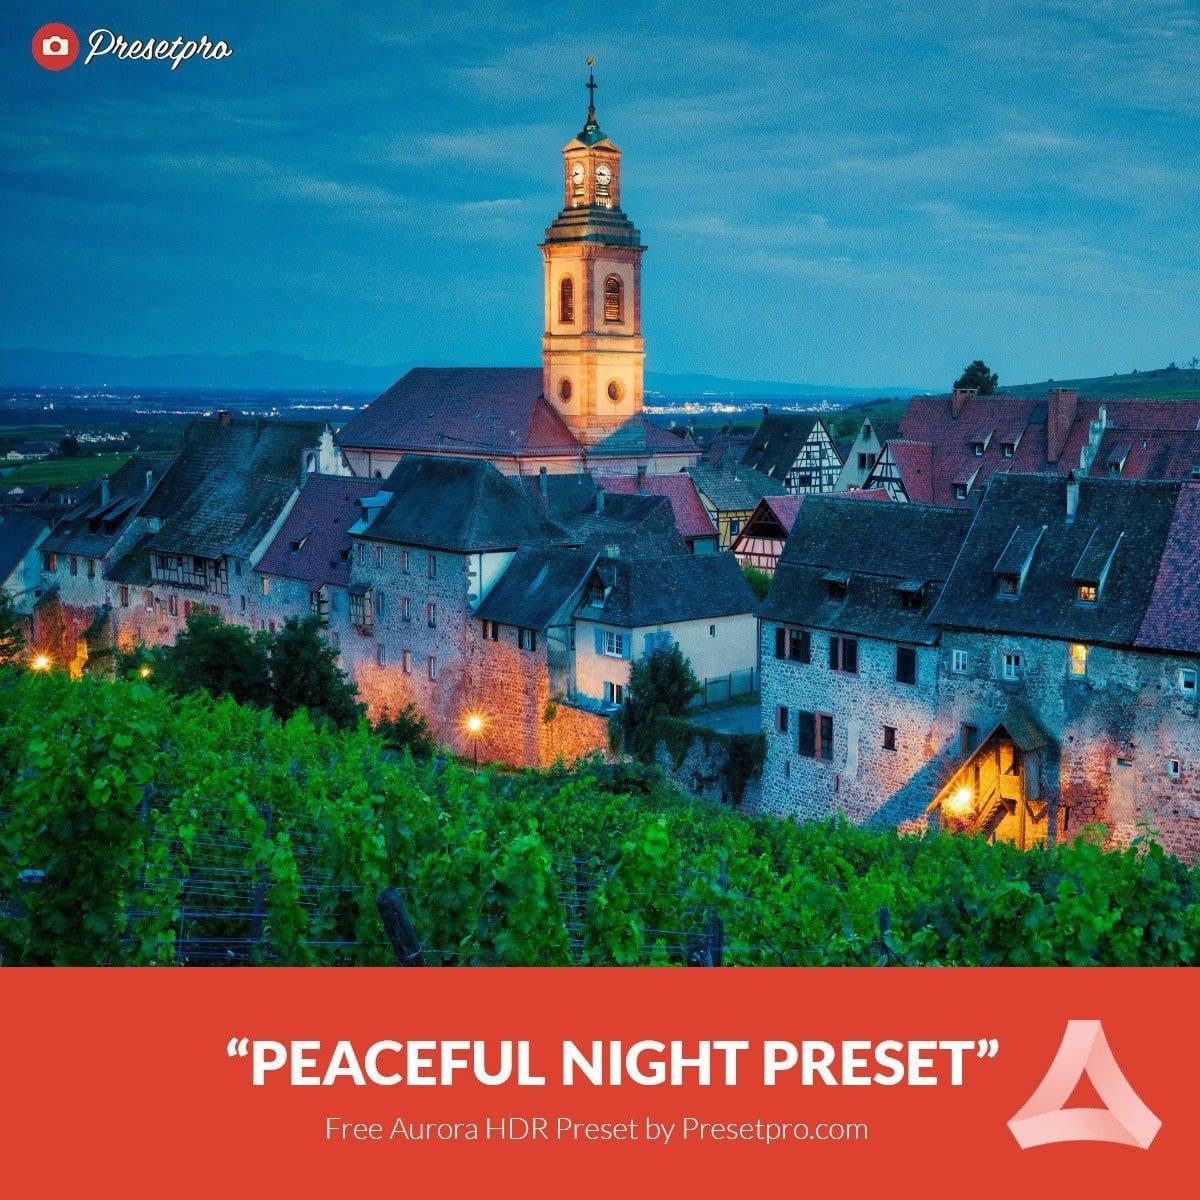 Free-Aurora-HDR-Preset-Peaceful-Night-Presetpro